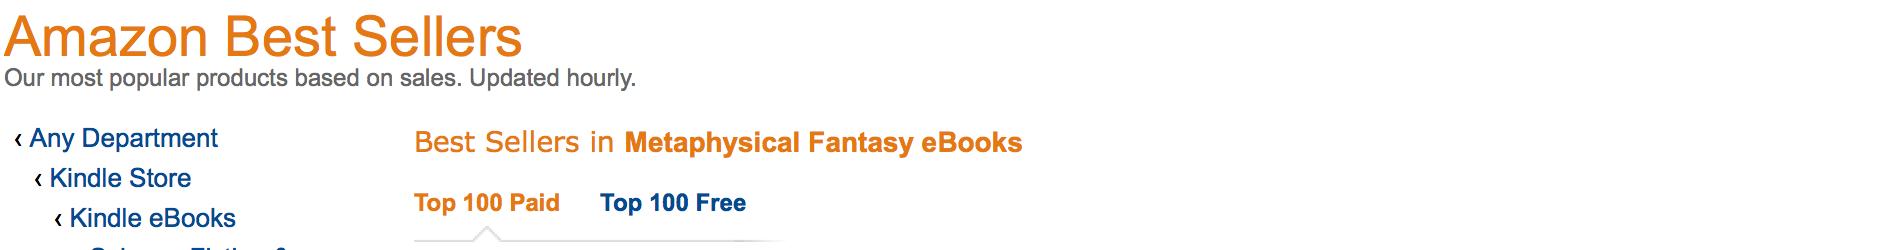 Top 20 in Amazon Seller List